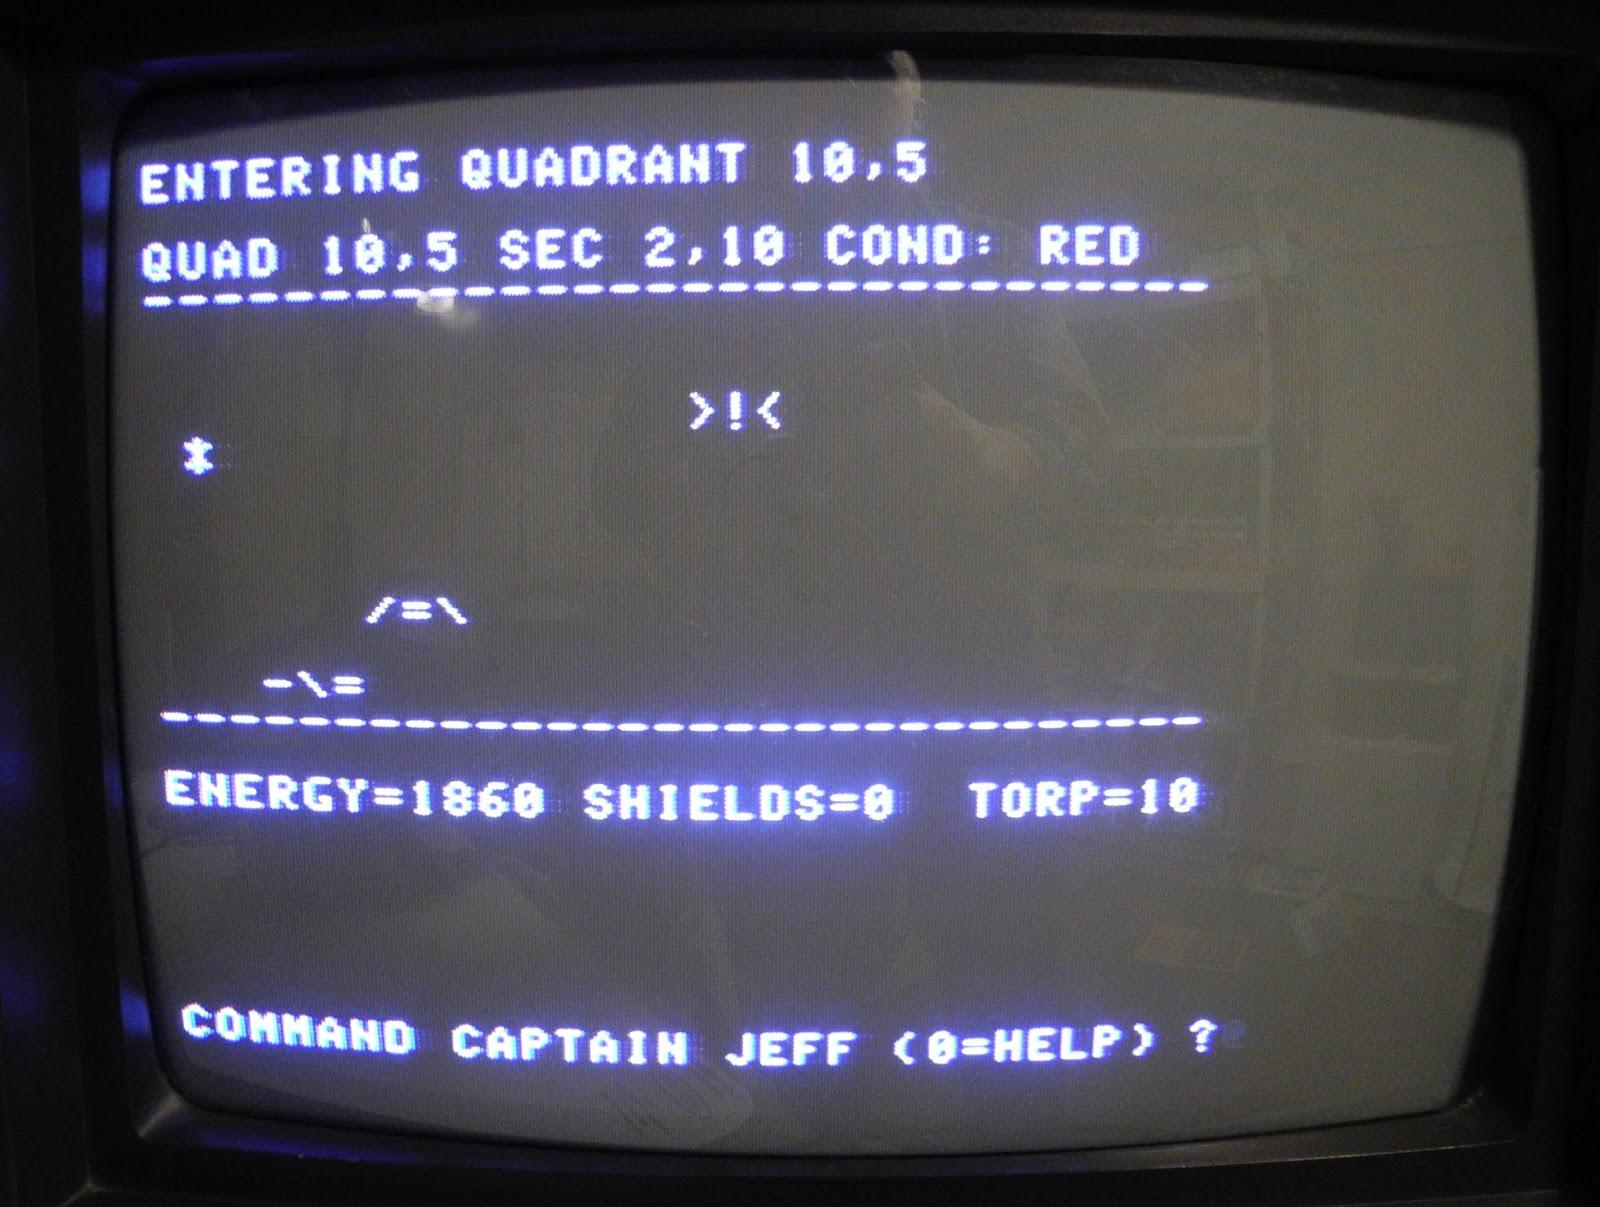 Star Trek, Credits to Jeff Tranter